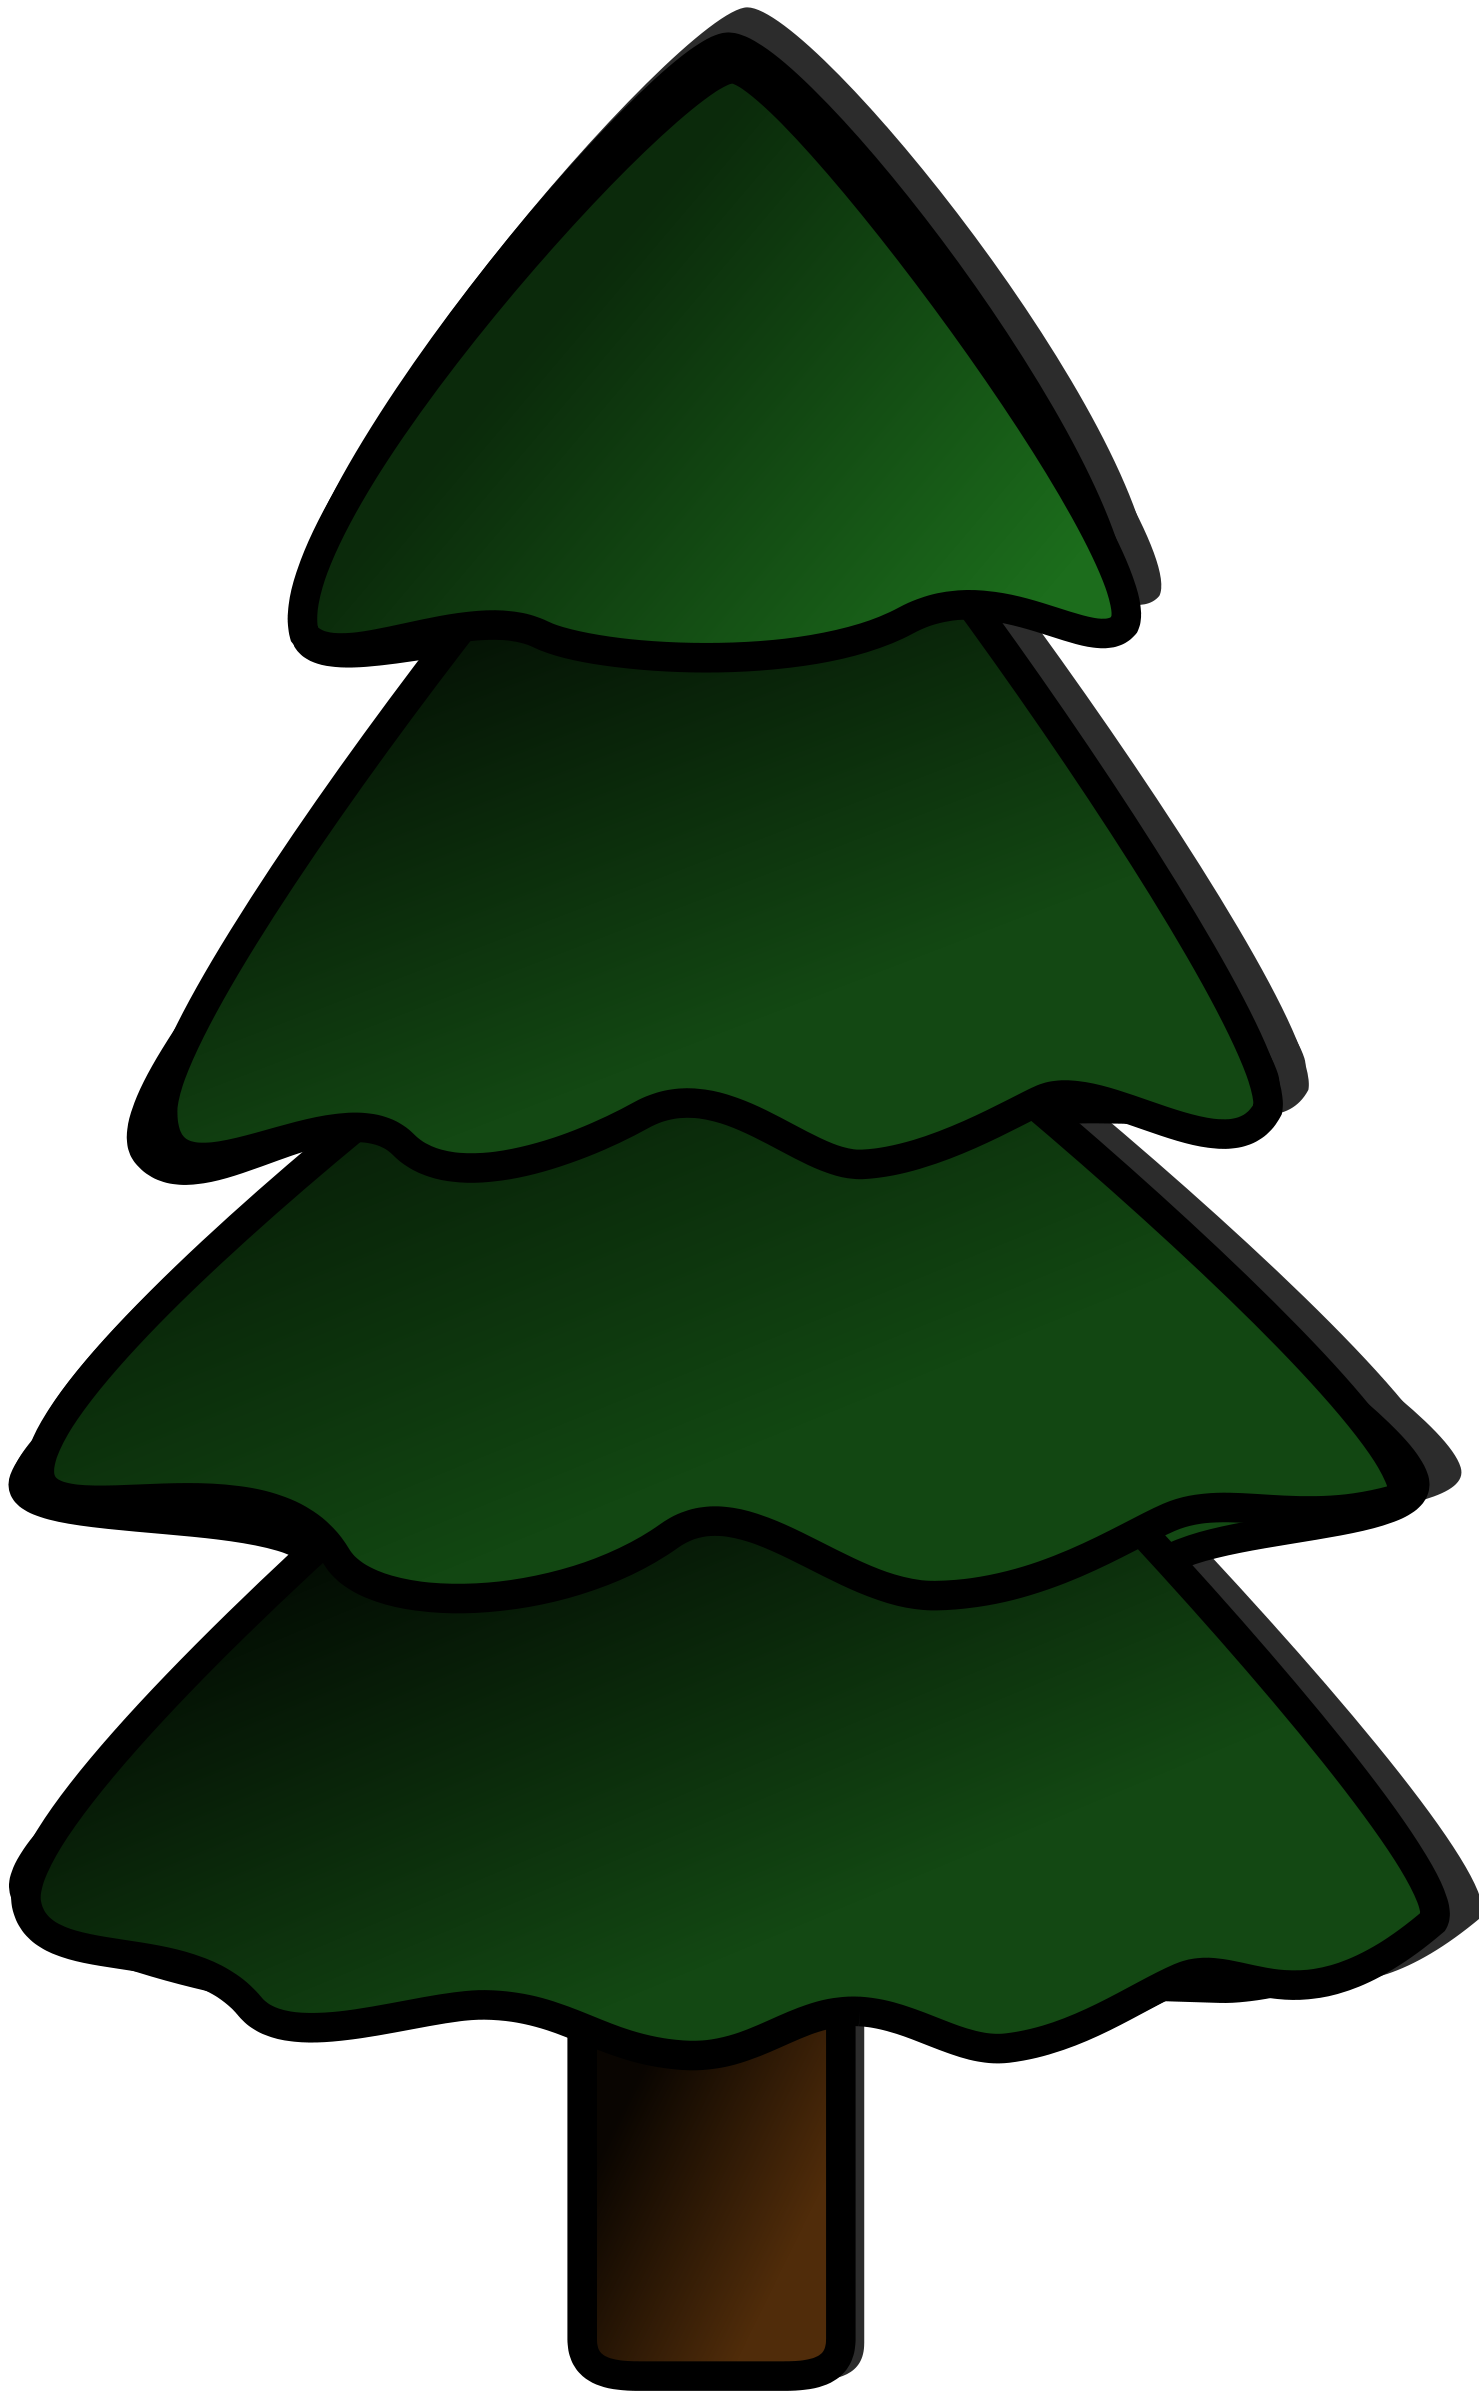 Pine Tree Clipart-pine tree clipart-5